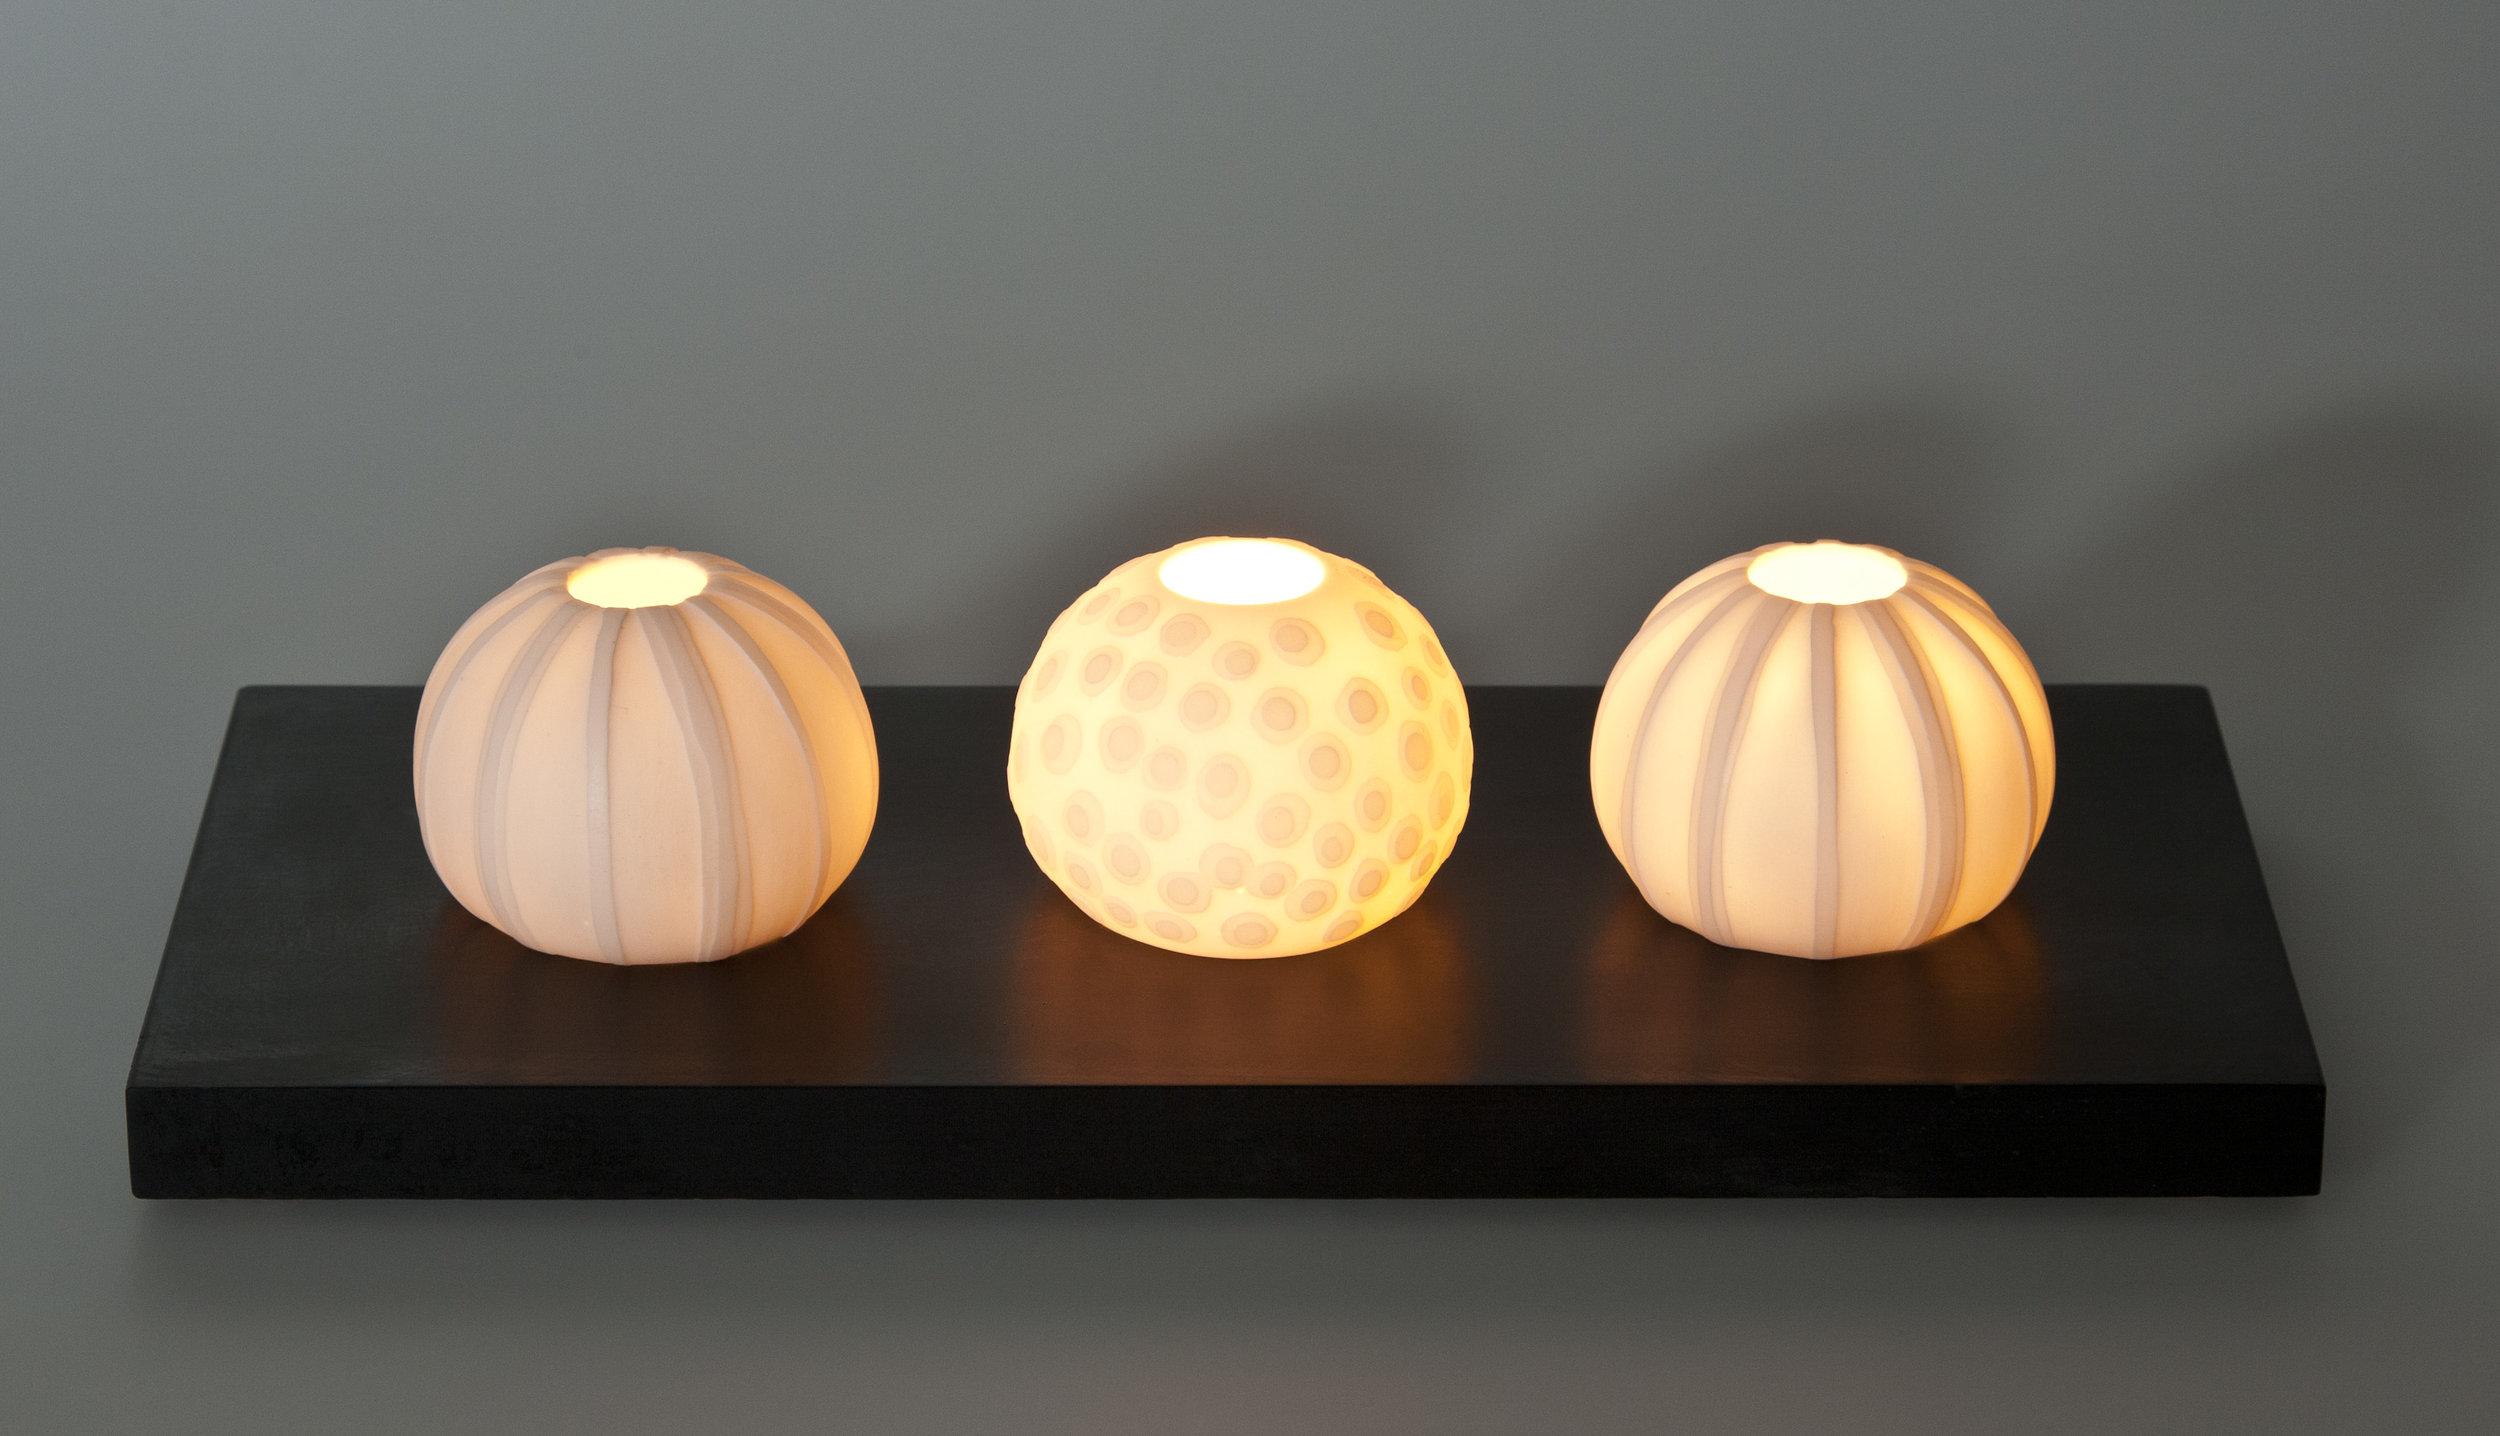 Urchin 'Ripple' tealights on slate base - 30 cm long